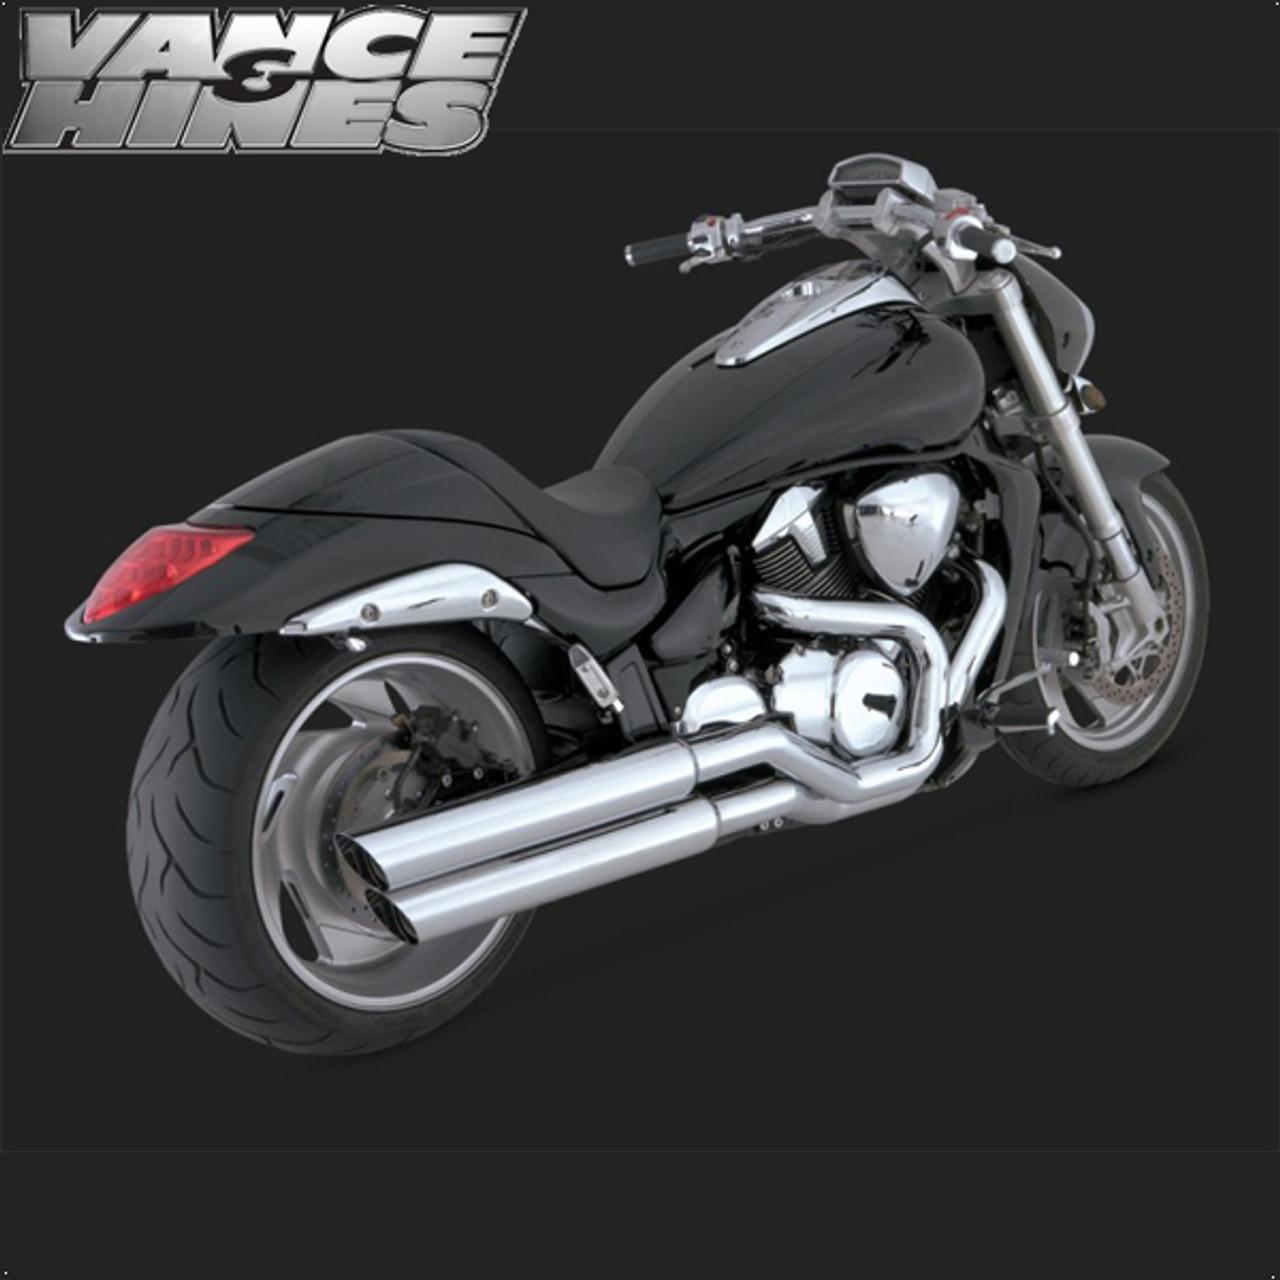 vance hines big shot full exhaust system suzuki m109r 06 11